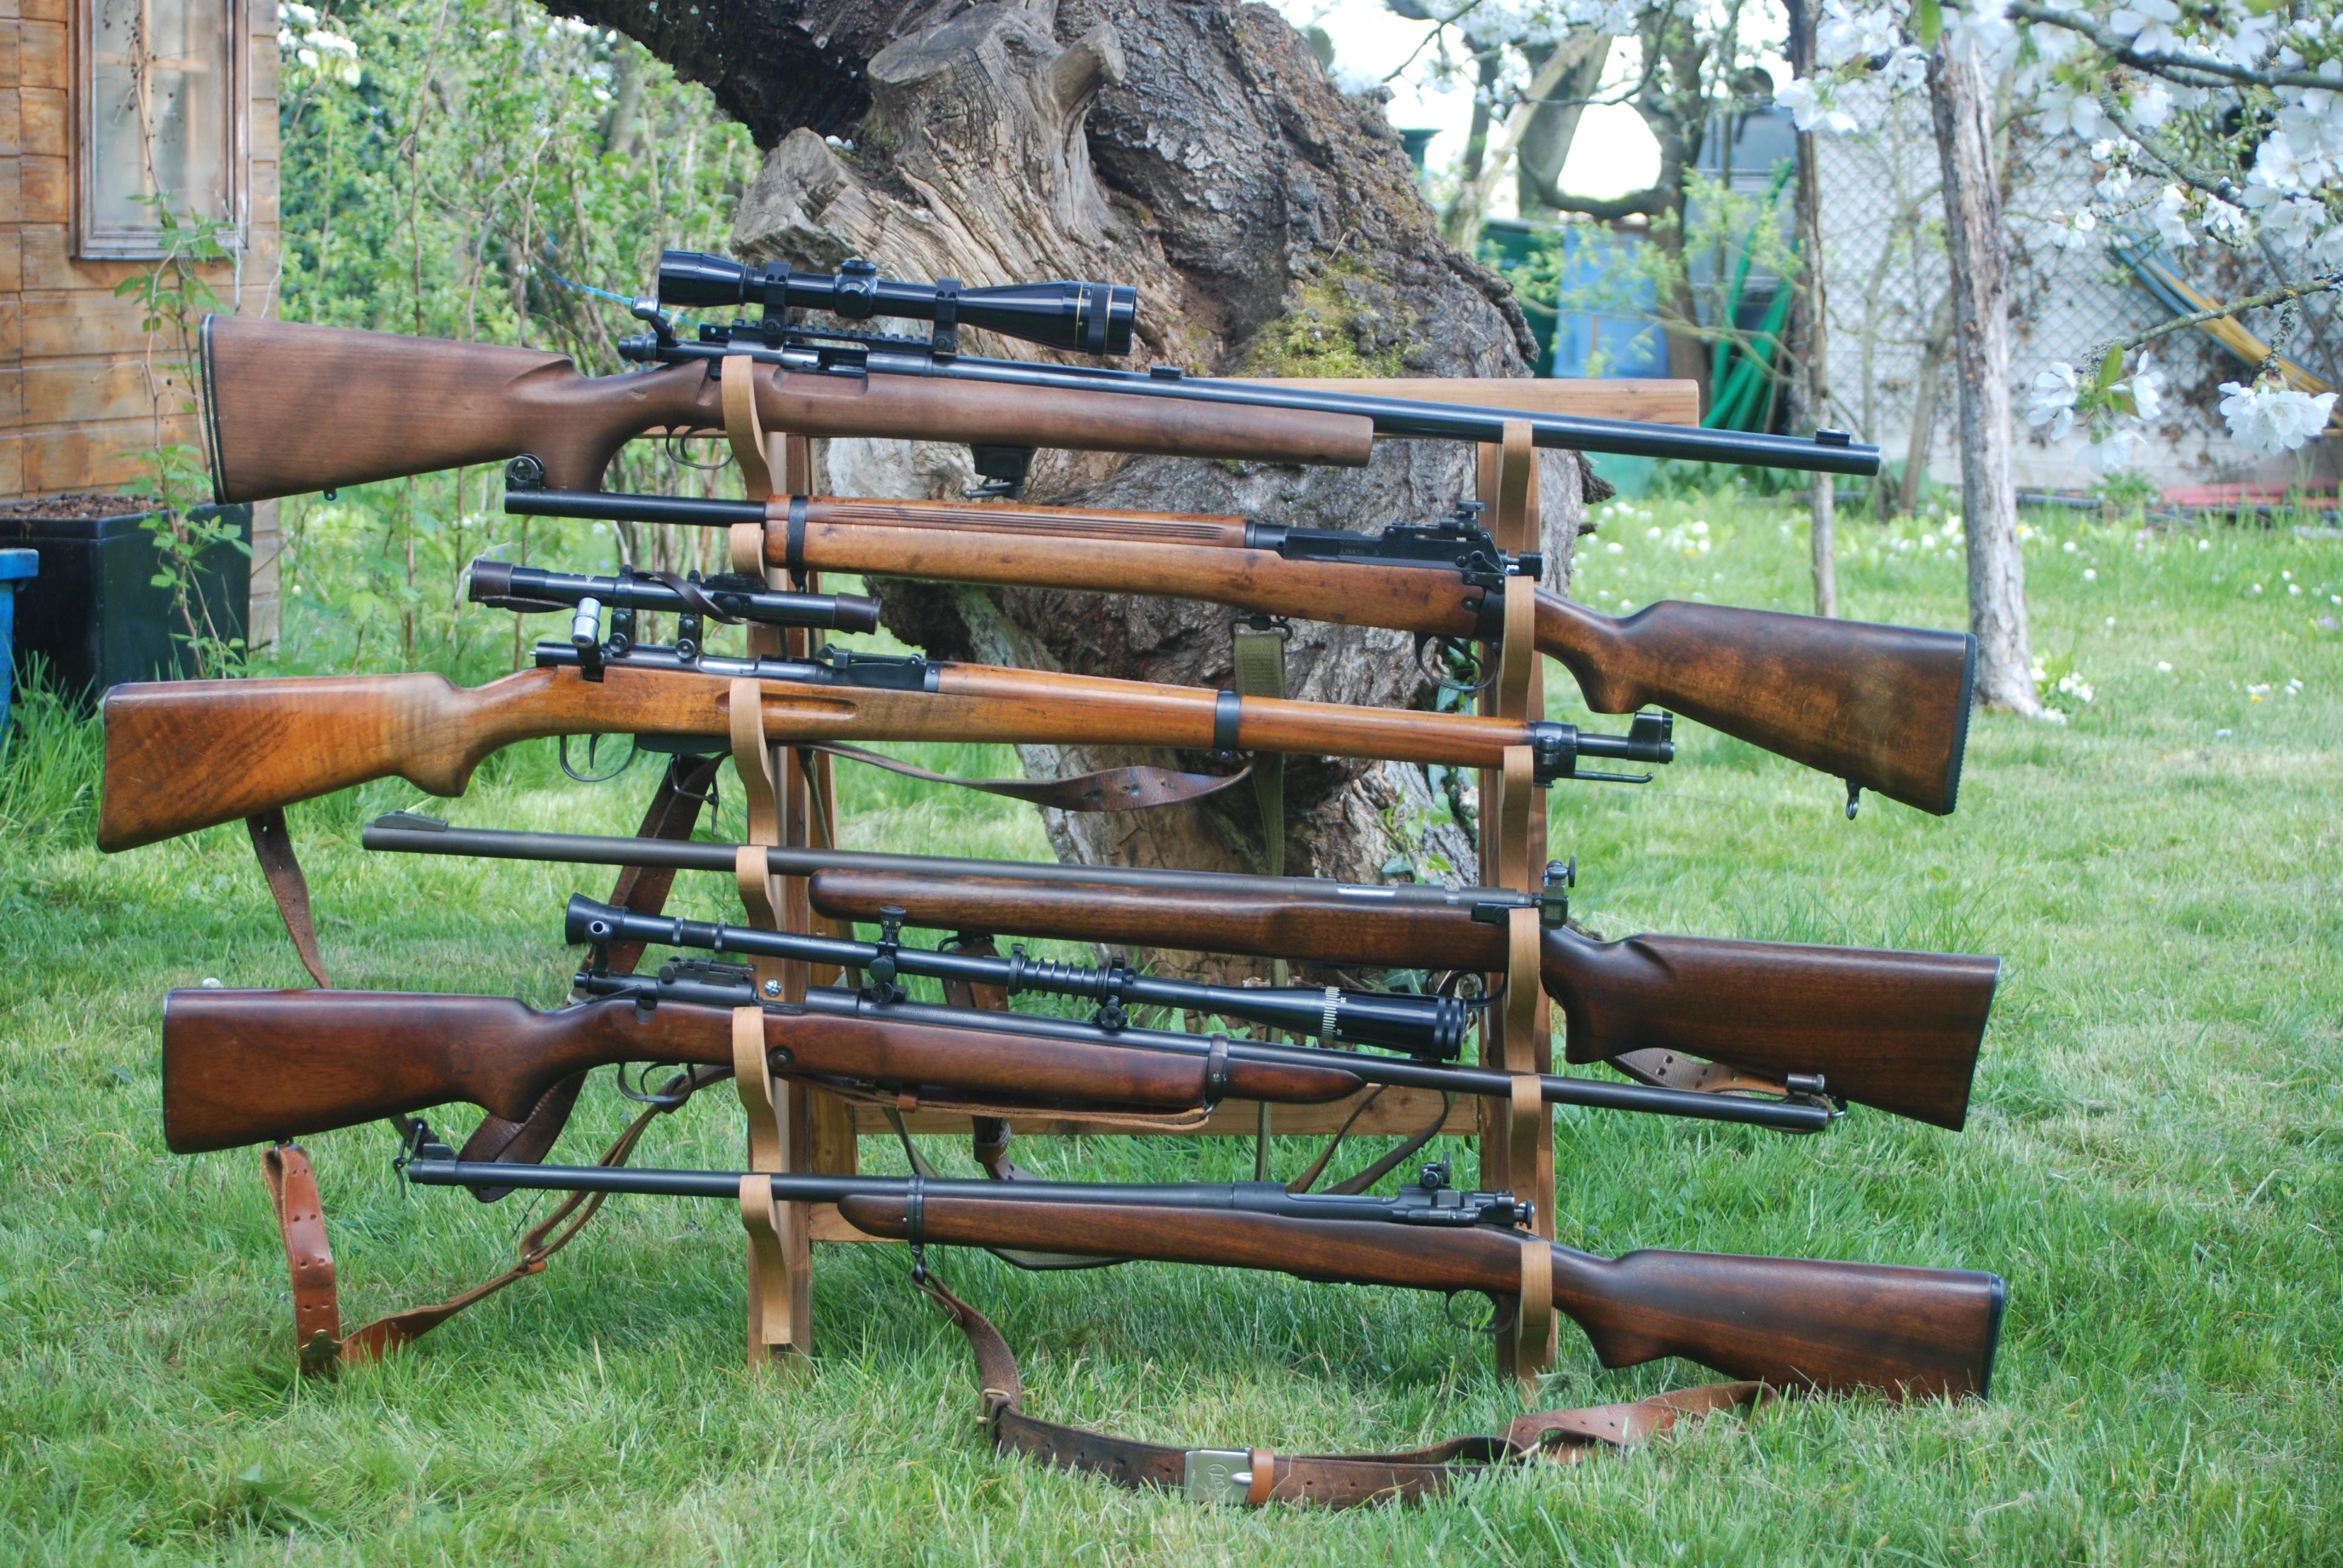 carabines 22Lr